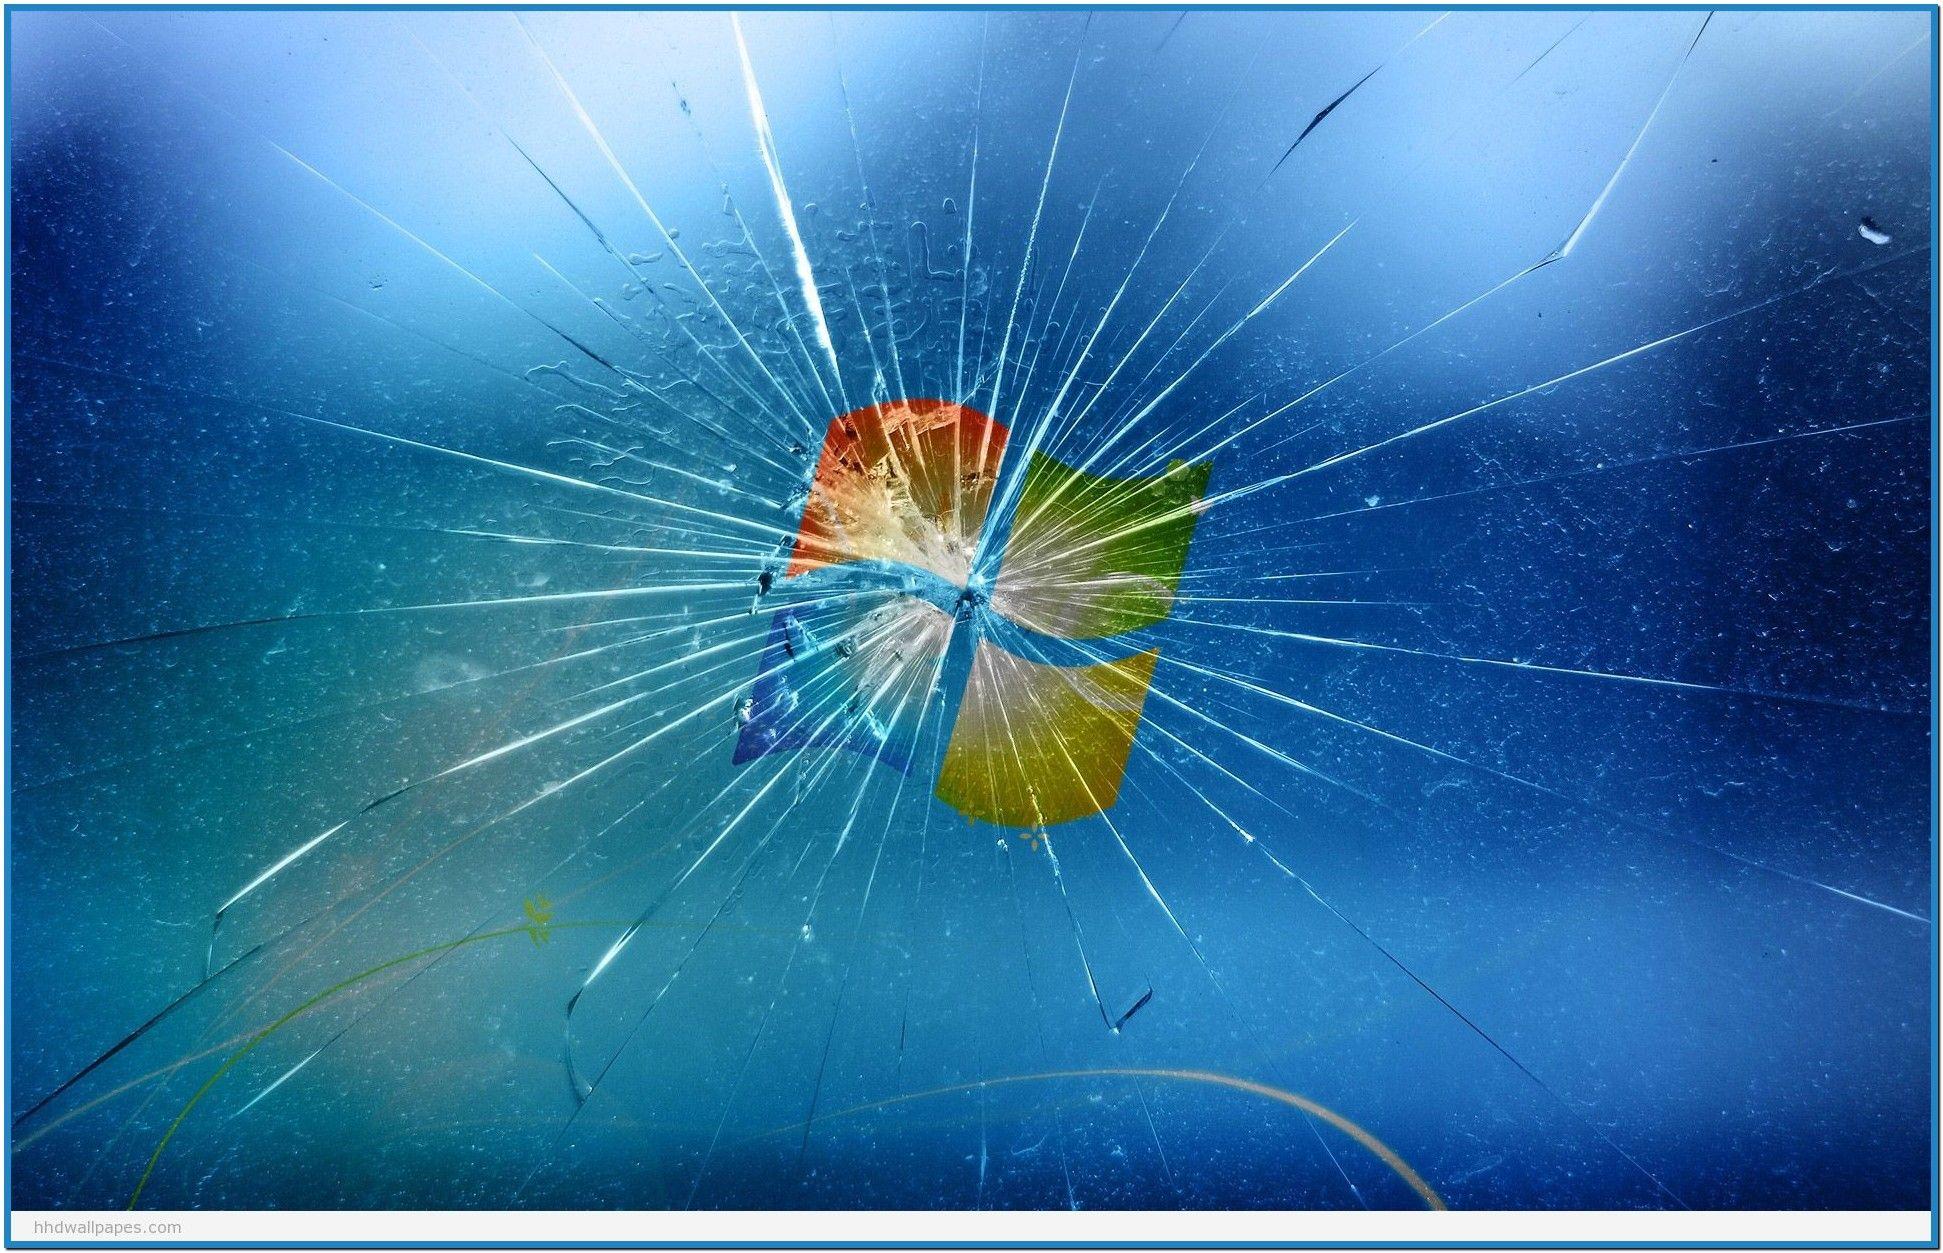 Screensavers For Windows 7 Free 3d Screensavers Windows 7 Broken Screen Wallpaper Screen Wallpaper Hd Windows Wallpaper